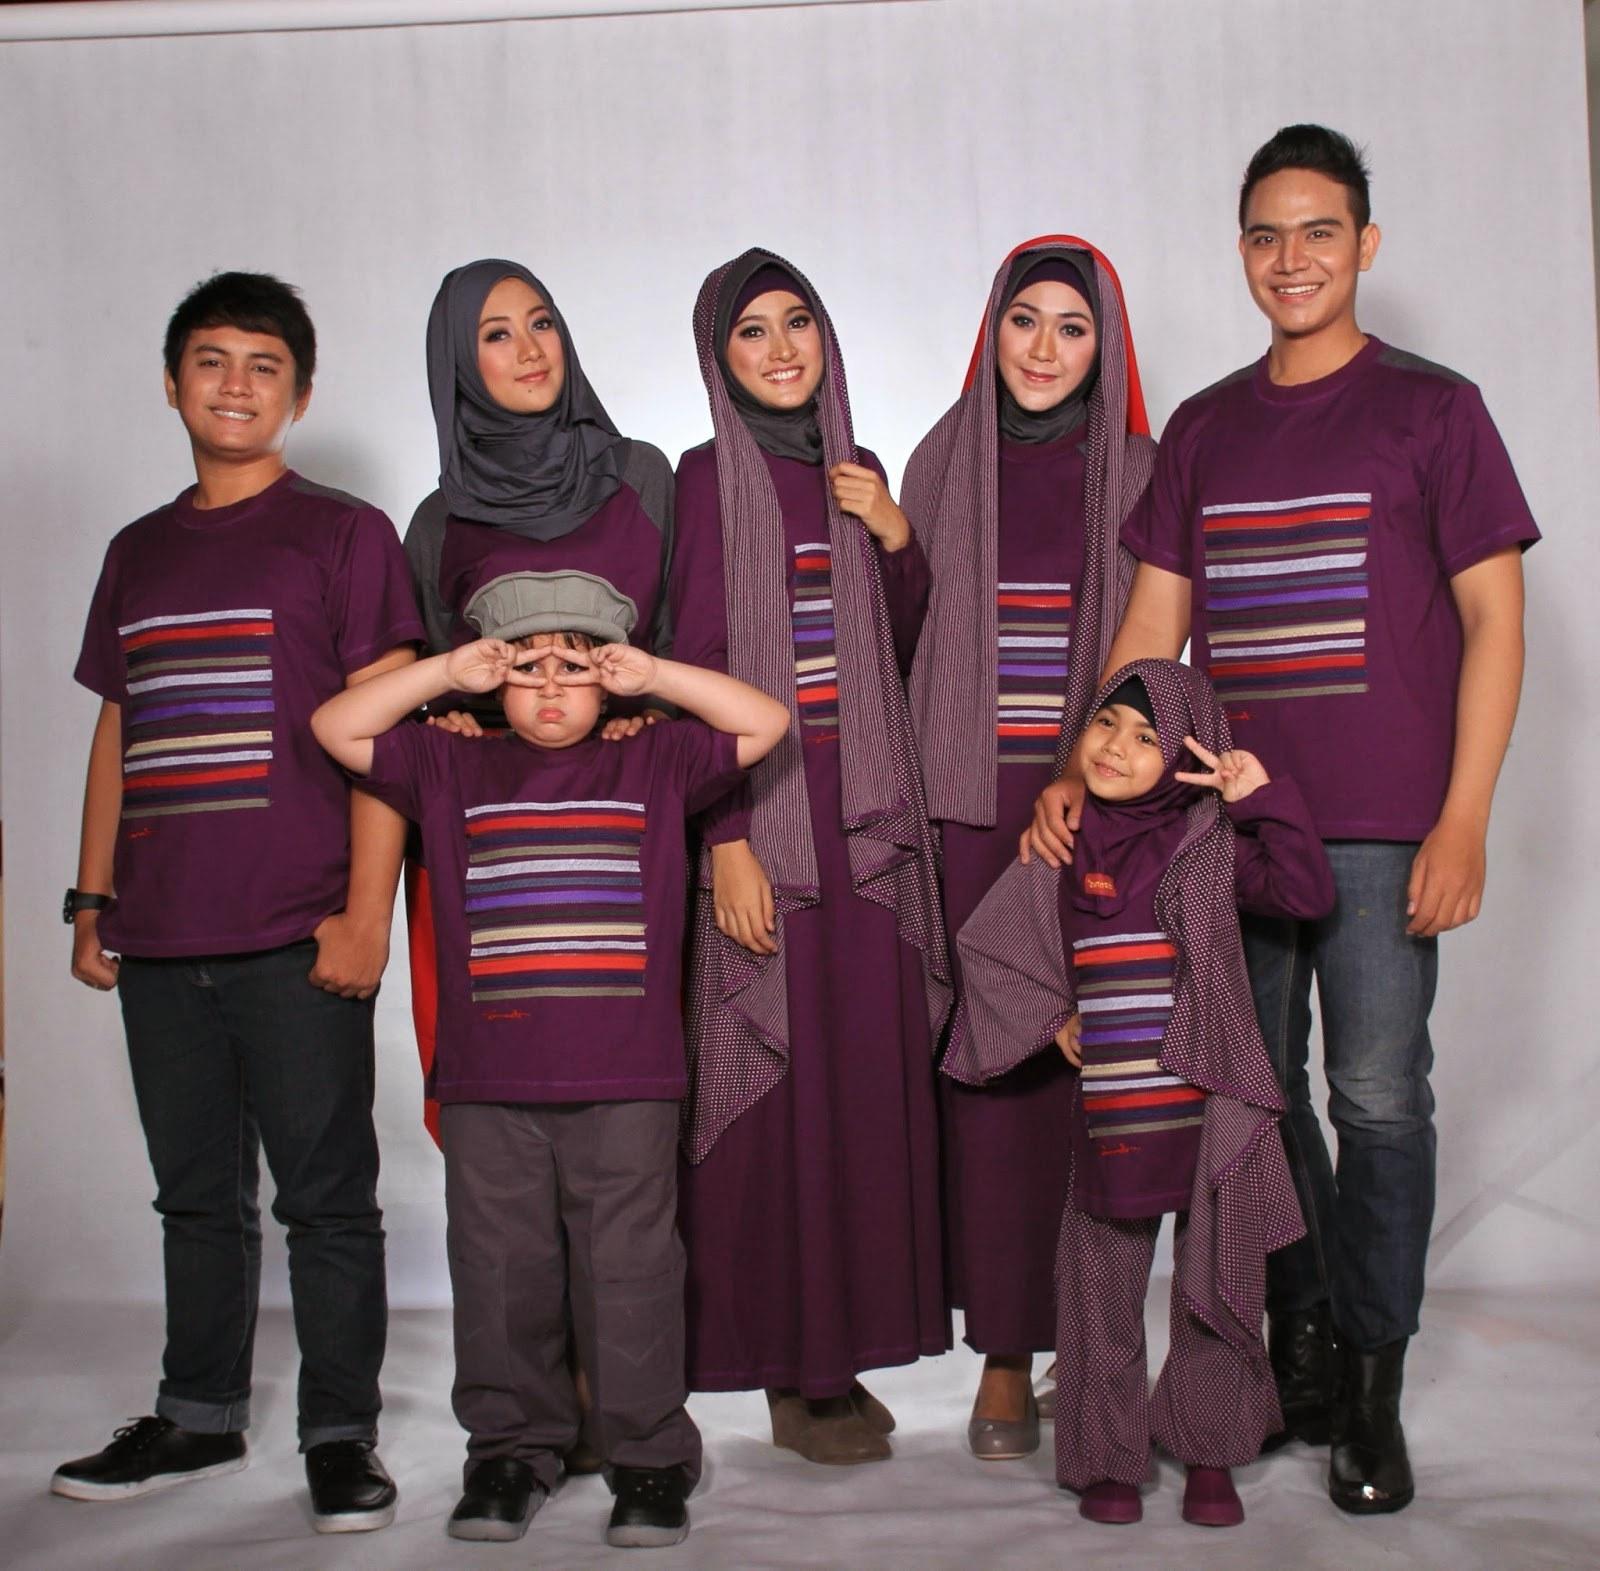 Design Baju Lebaran 2018 Anak Zwdg Model Baju Keluarga Untuk Hari Raya Lebaran 2018